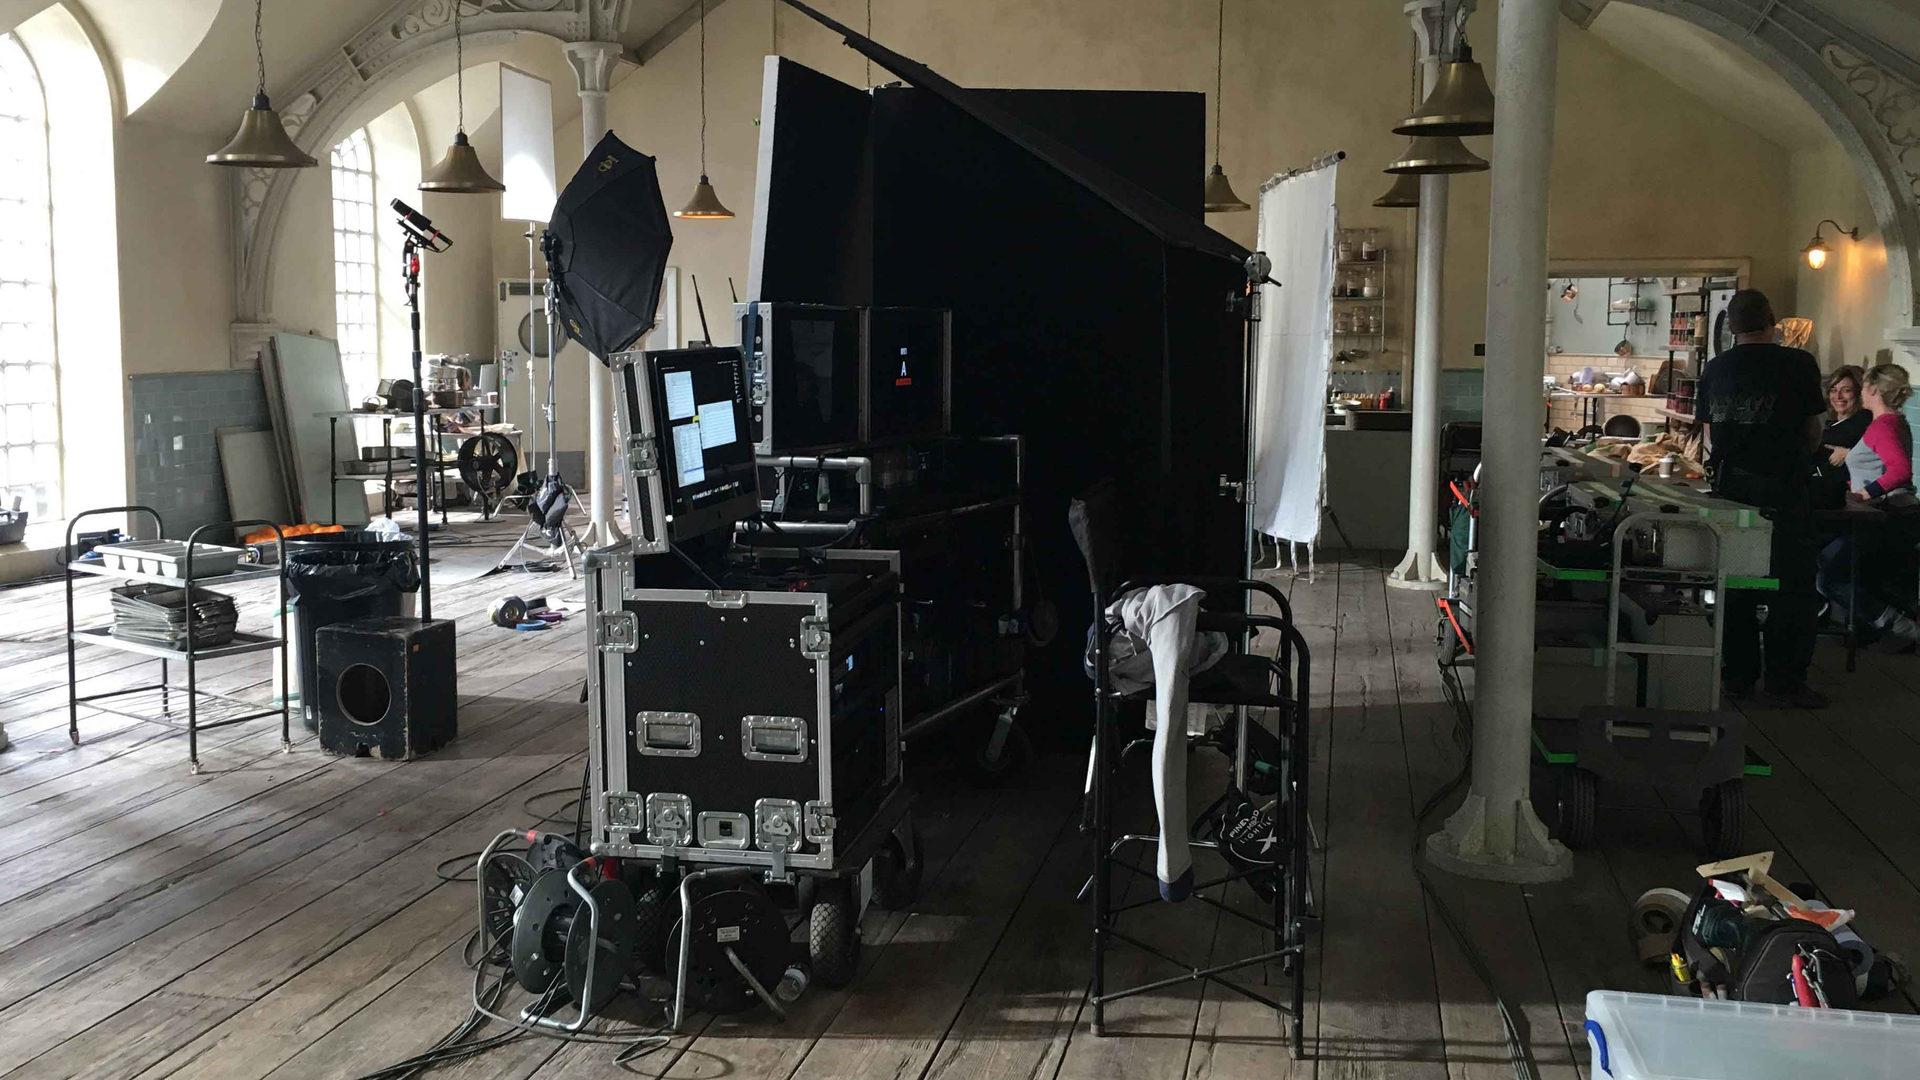 Digital Imaging Technician on the set of Paddington 2